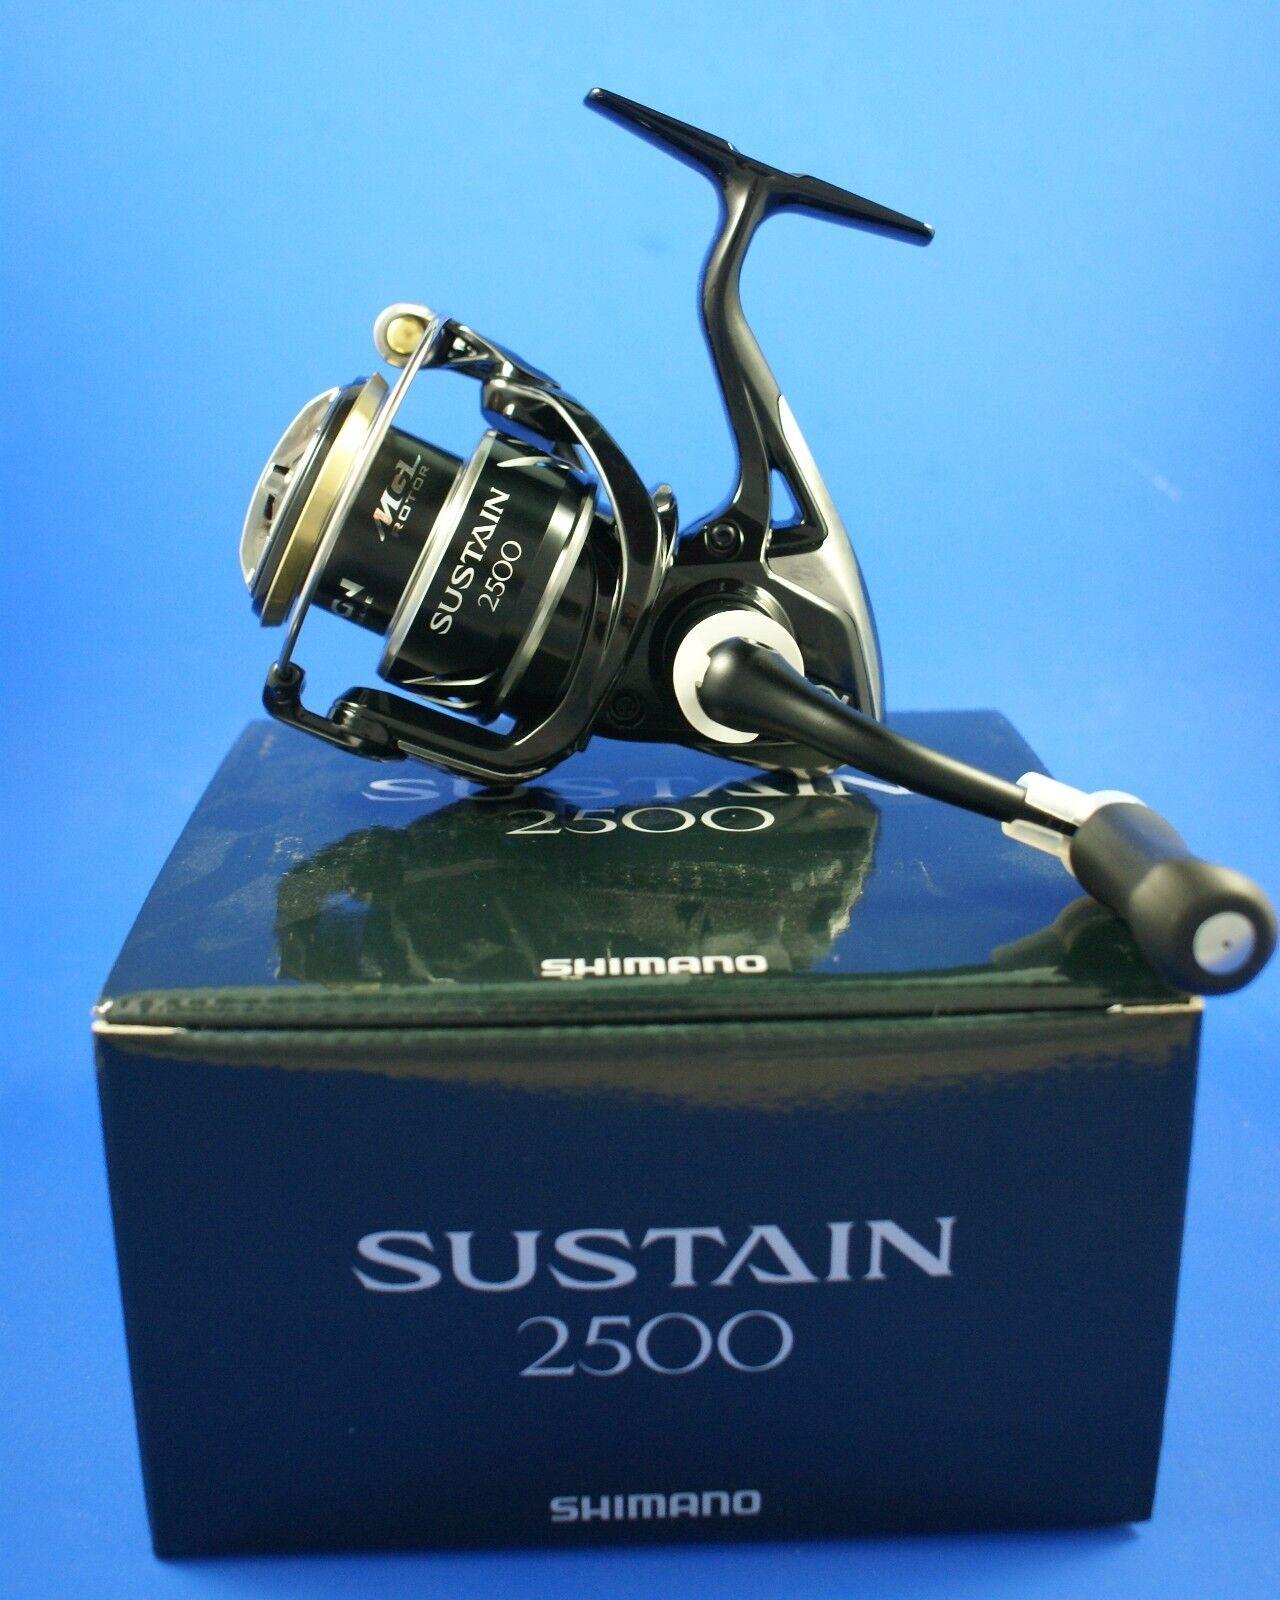 Shimano Sustain 2500 FI     SA2500FI    Front Drag Fishing Reel  is discounted